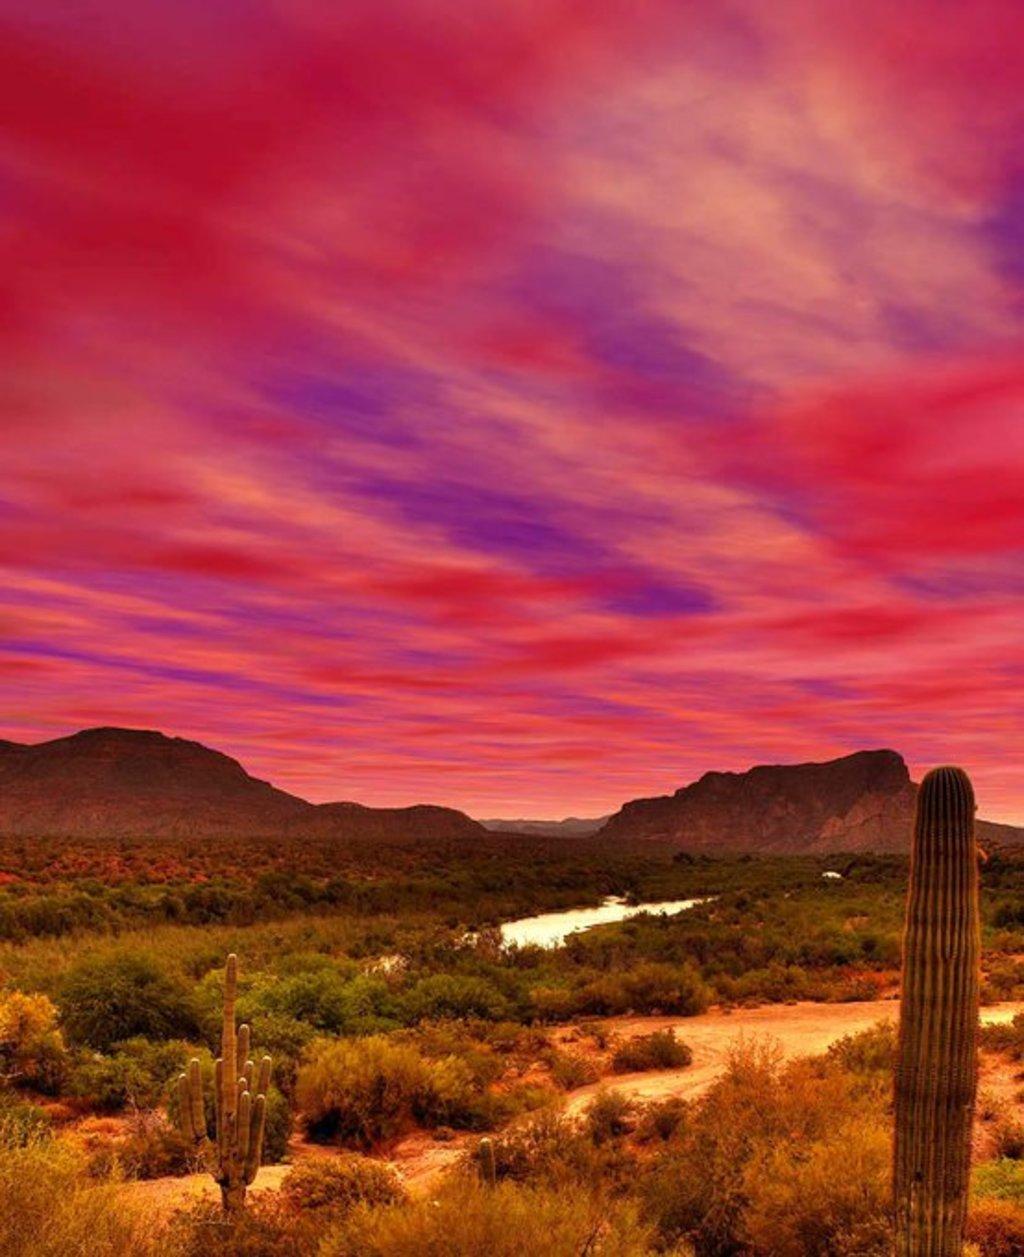 Arizona Cactus via Mike Bertelsen